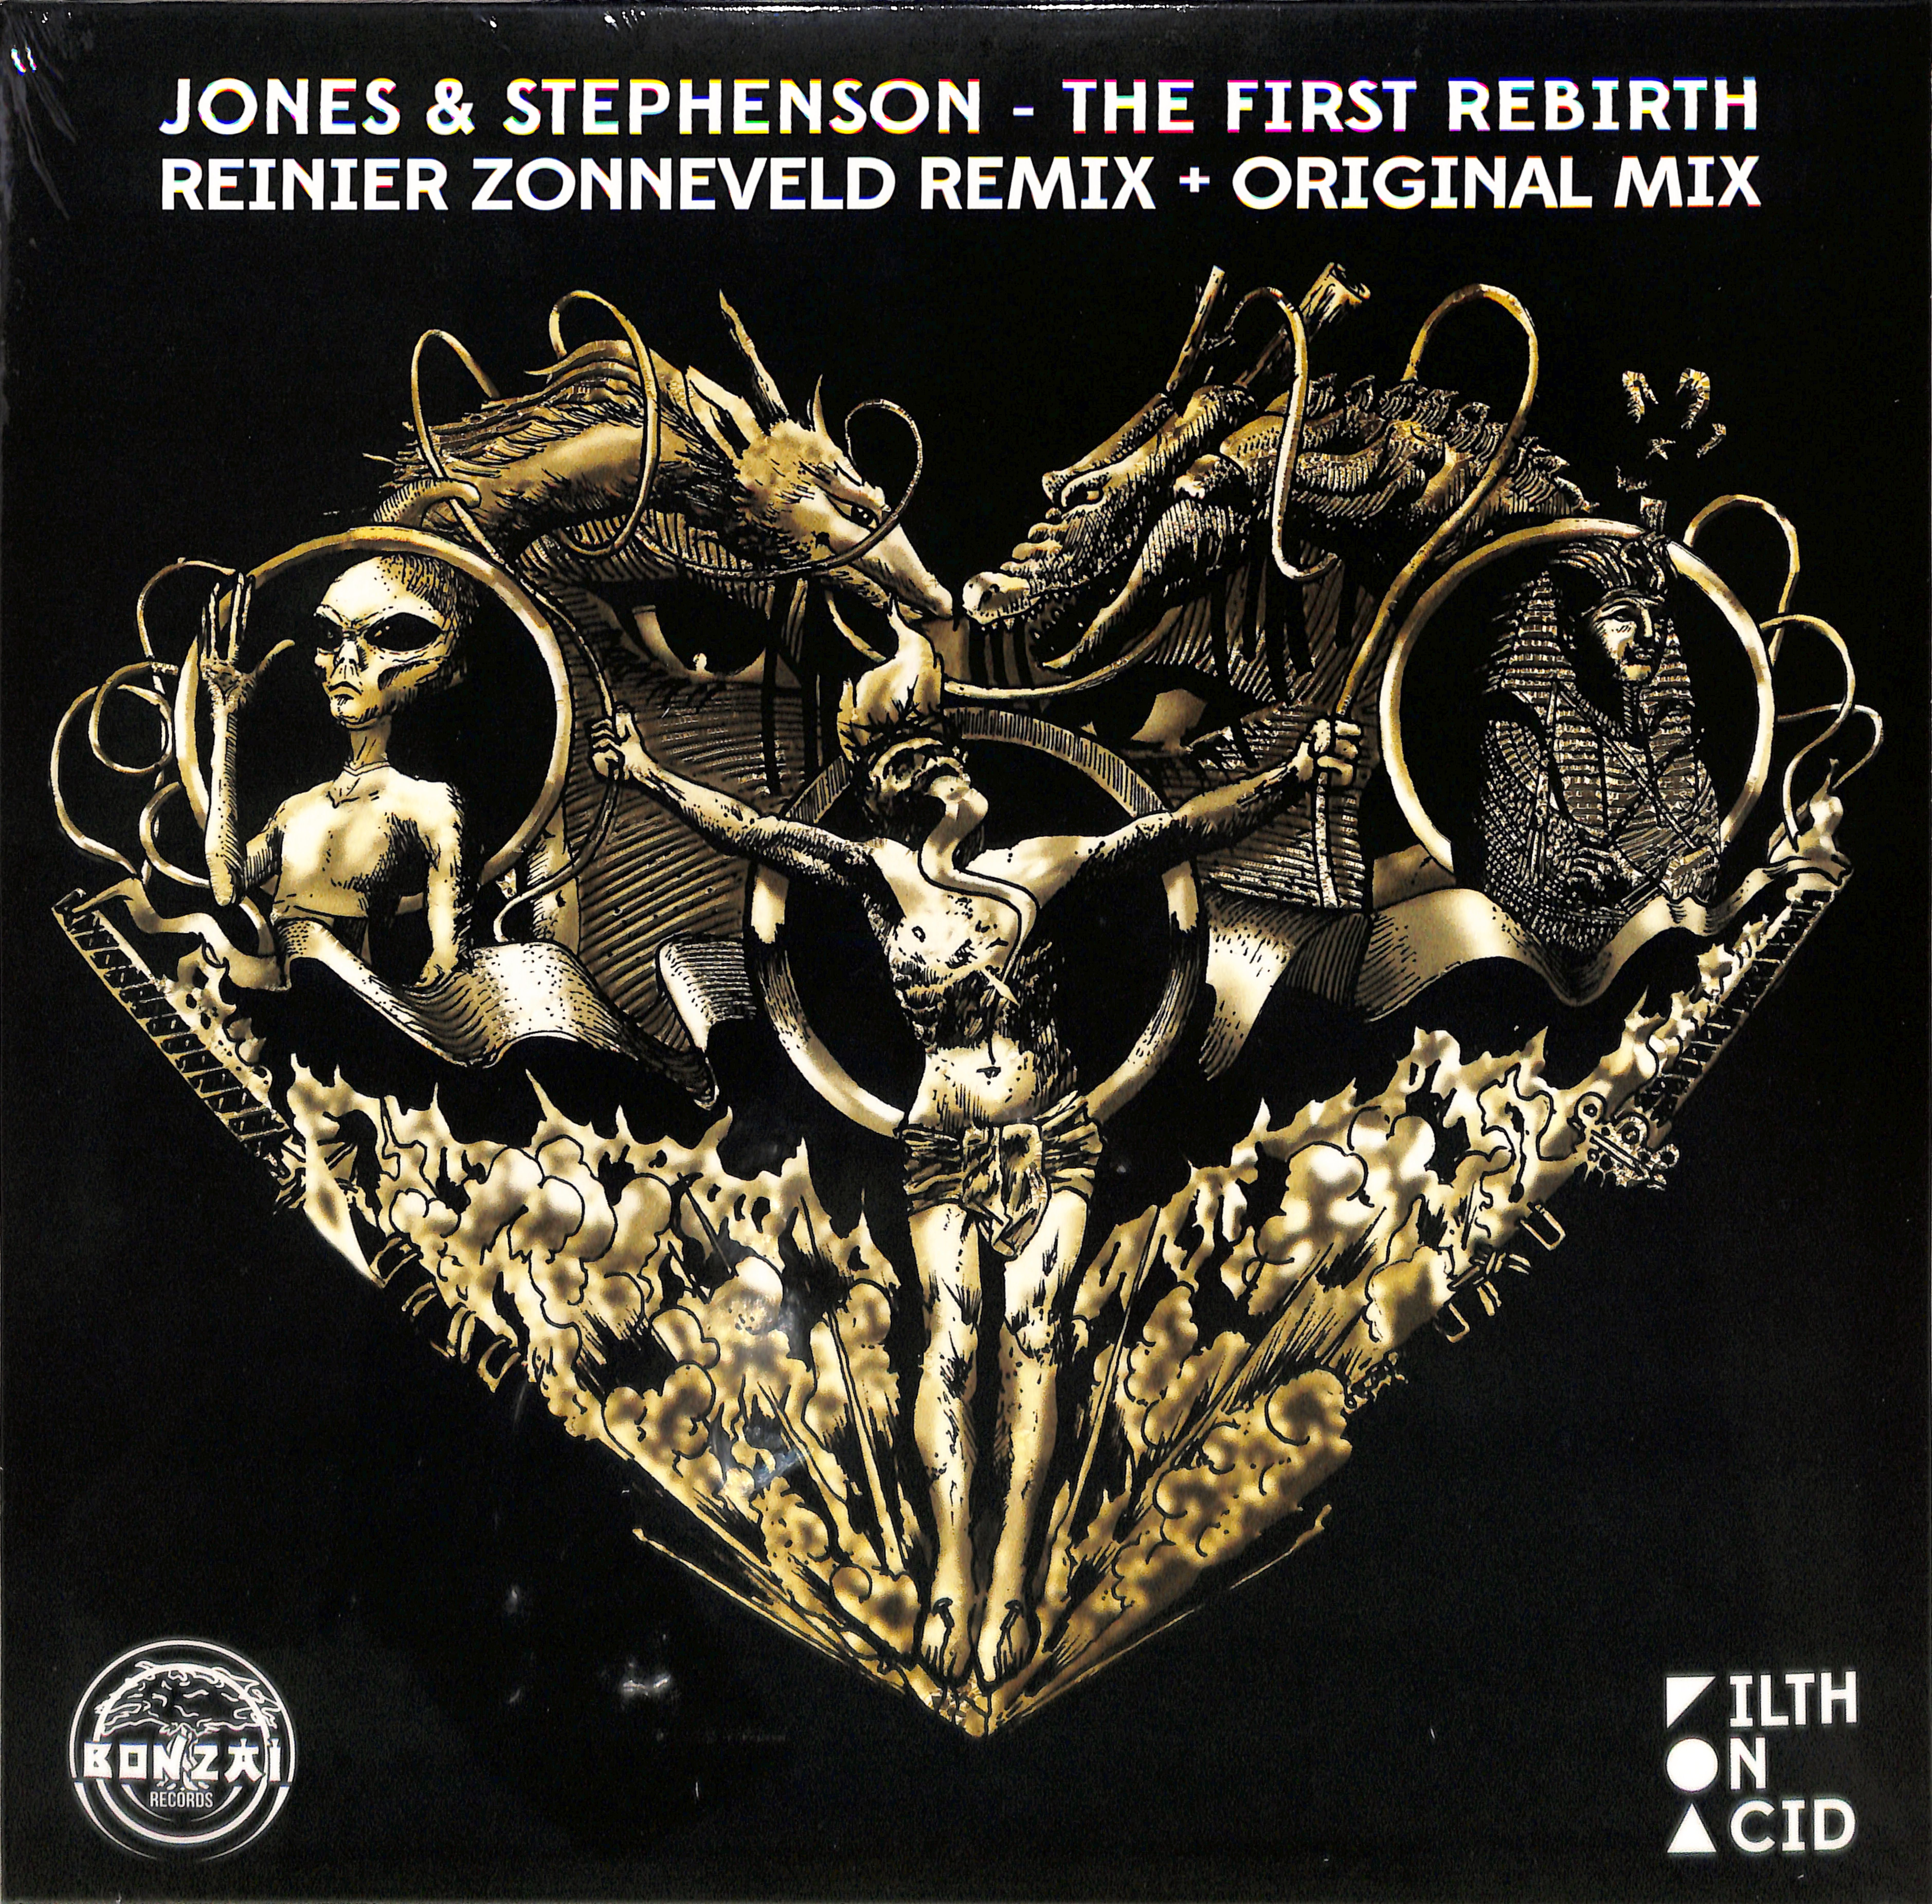 Jones & Stephenson - THE FIRST REBIRTH